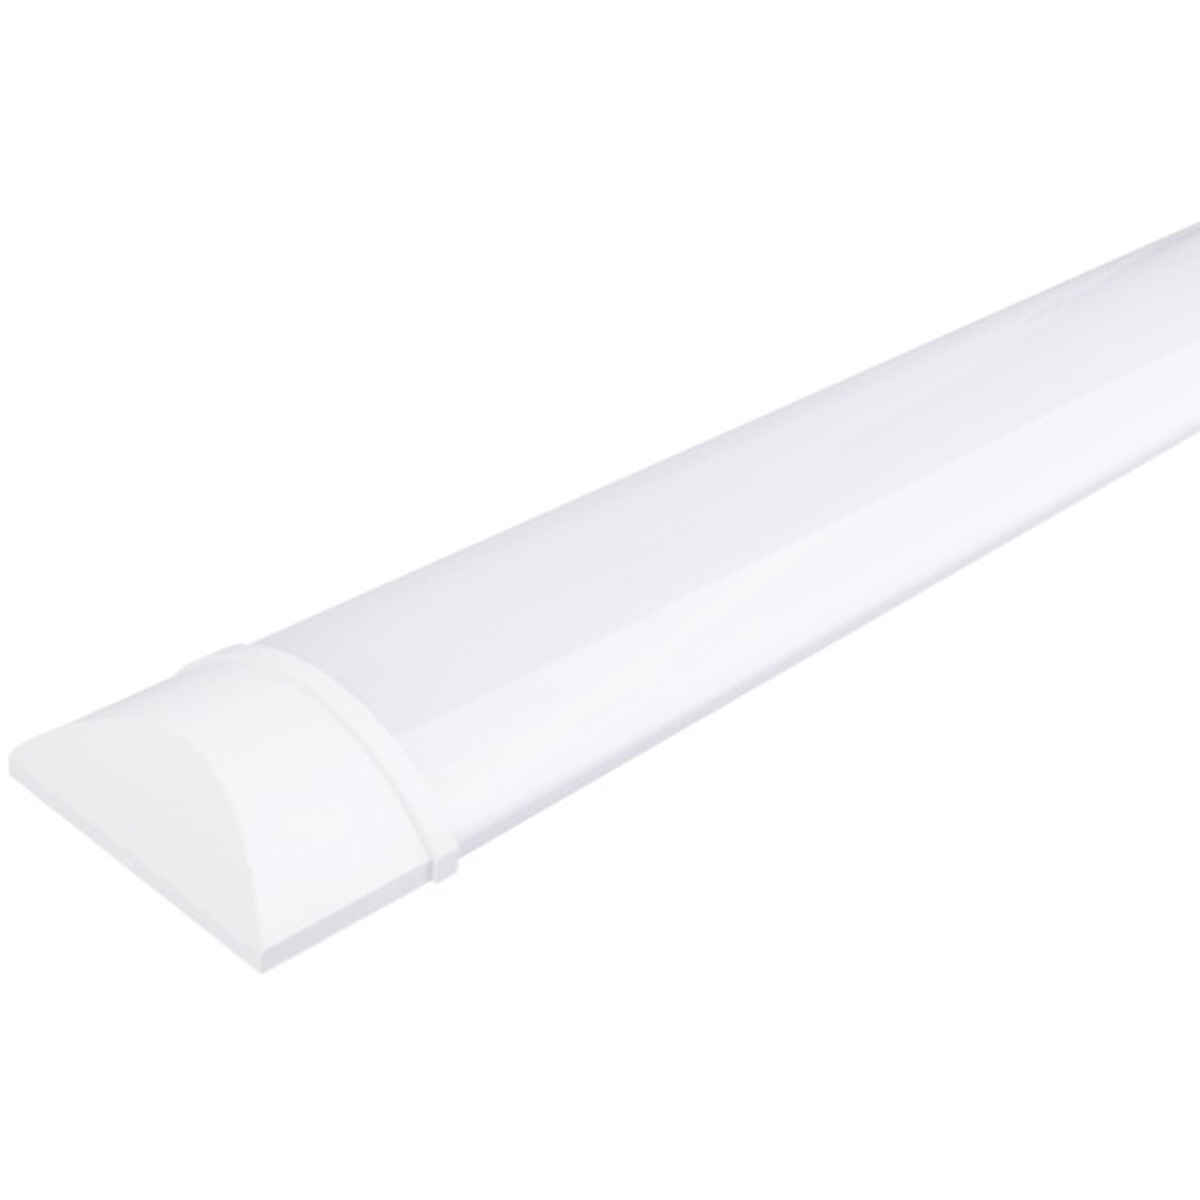 LED Balk - Aigi Tynom - 30W - Helder/Koud Wit 6000K - Mat Wit - Kunststof - 90cm